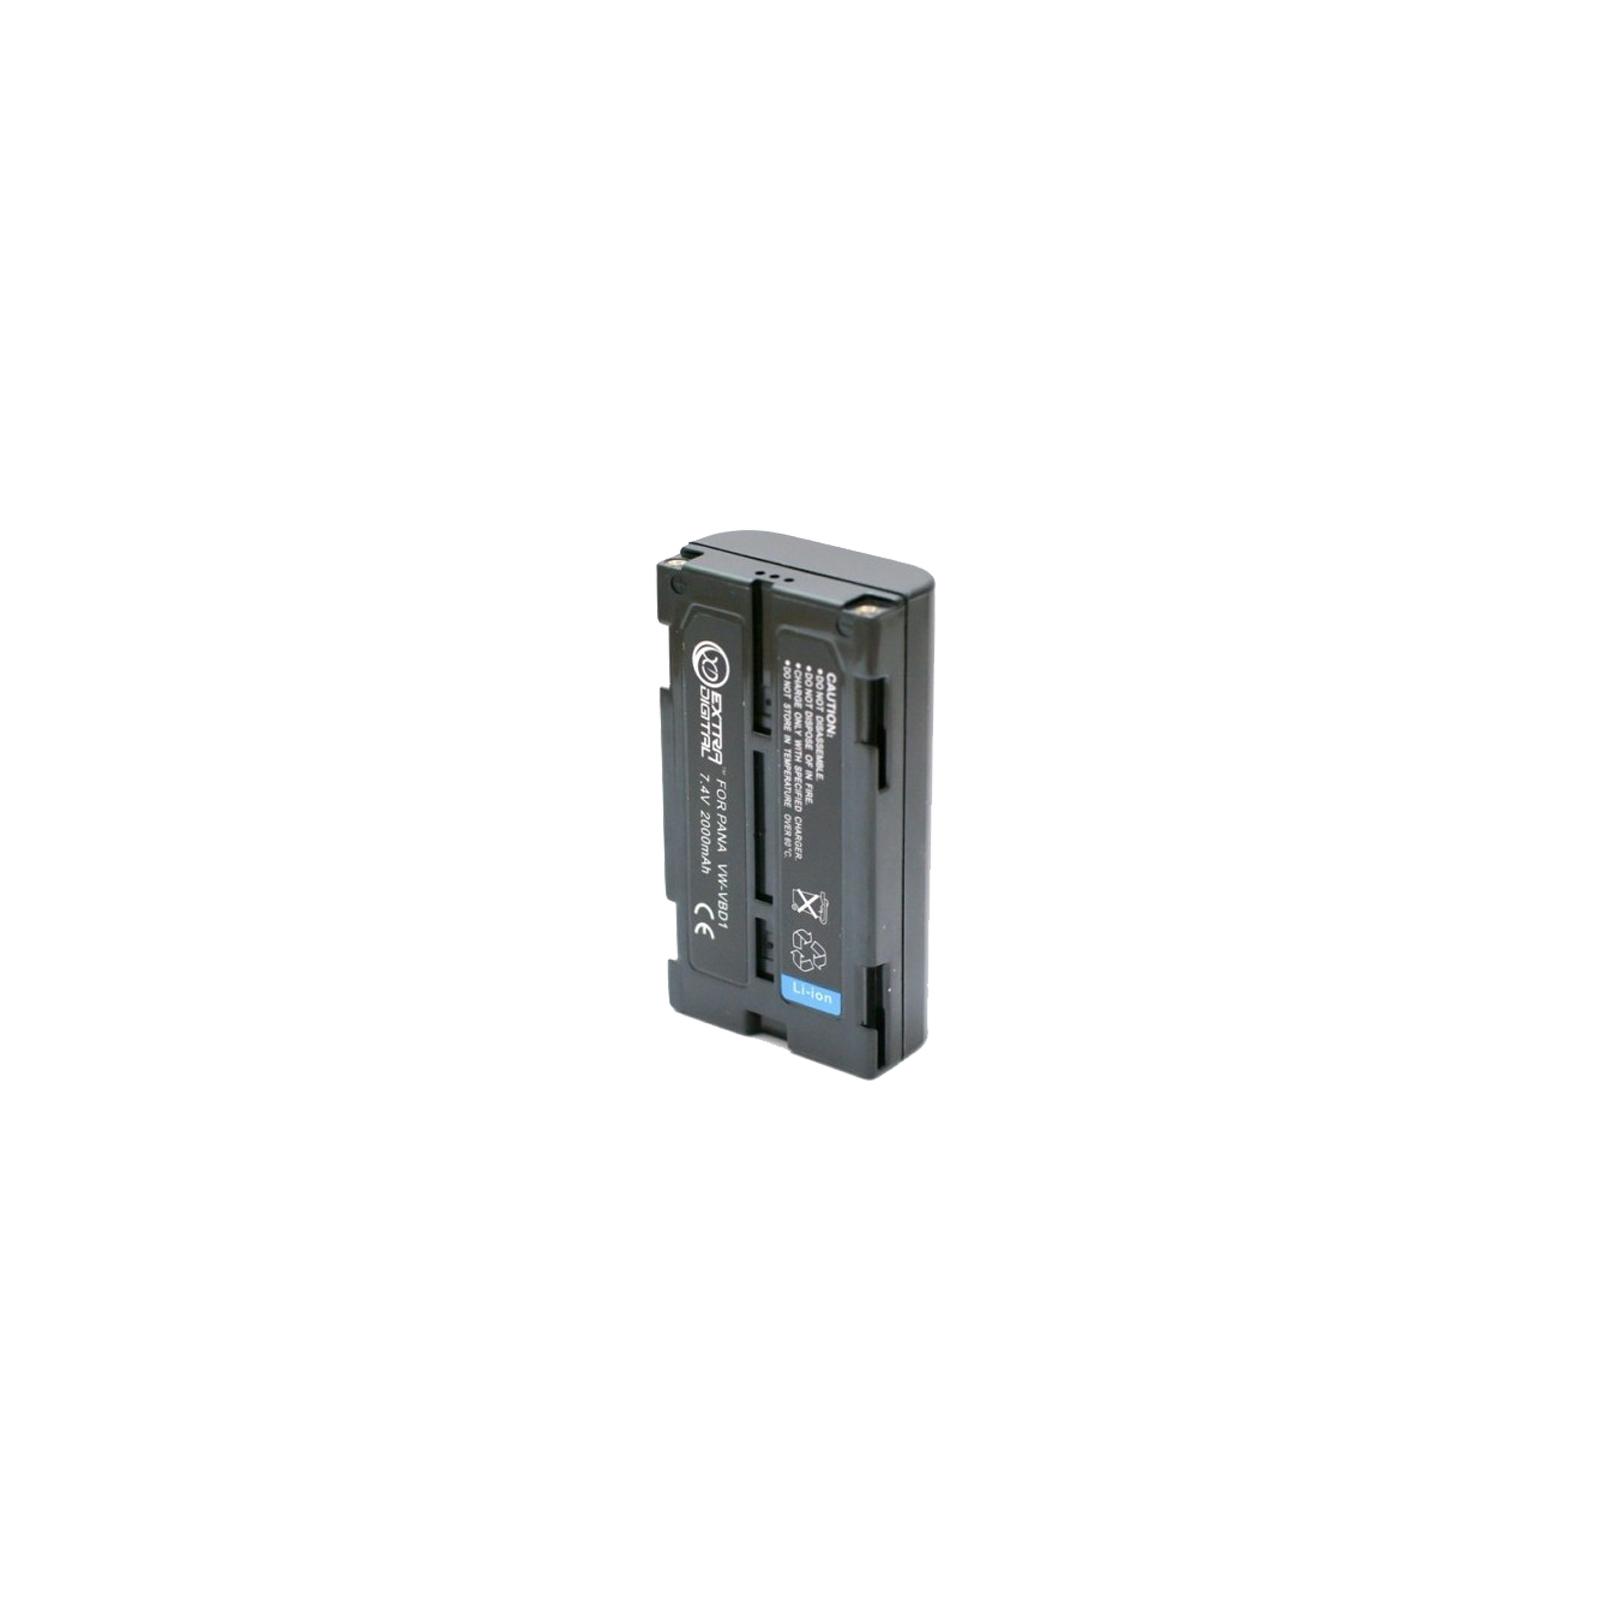 Аккумулятор к фото/видео EXTRADIGITAL Panasonic VW-VBD1, BN-V812 (DV00DV1324) изображение 2